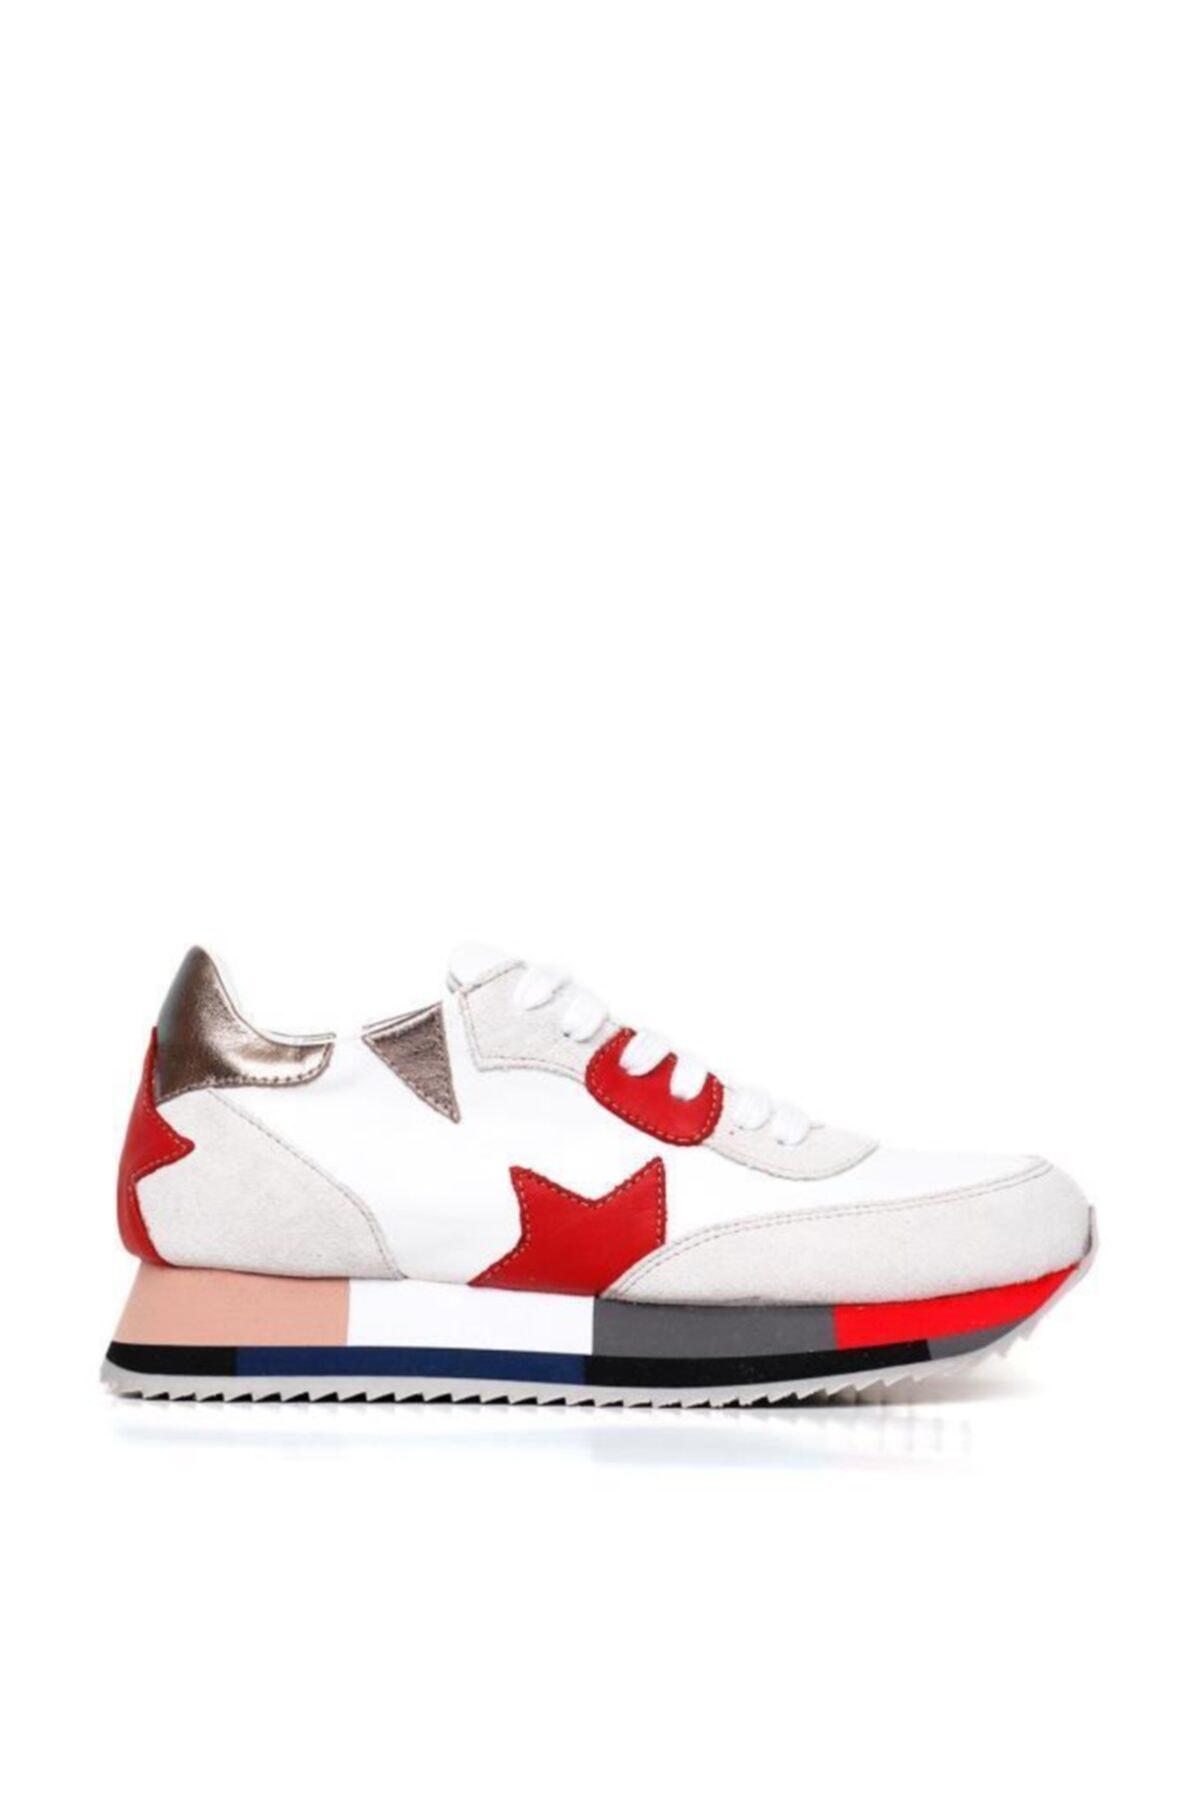 BUENO Shoes Kadın Spor 20wq5400 1